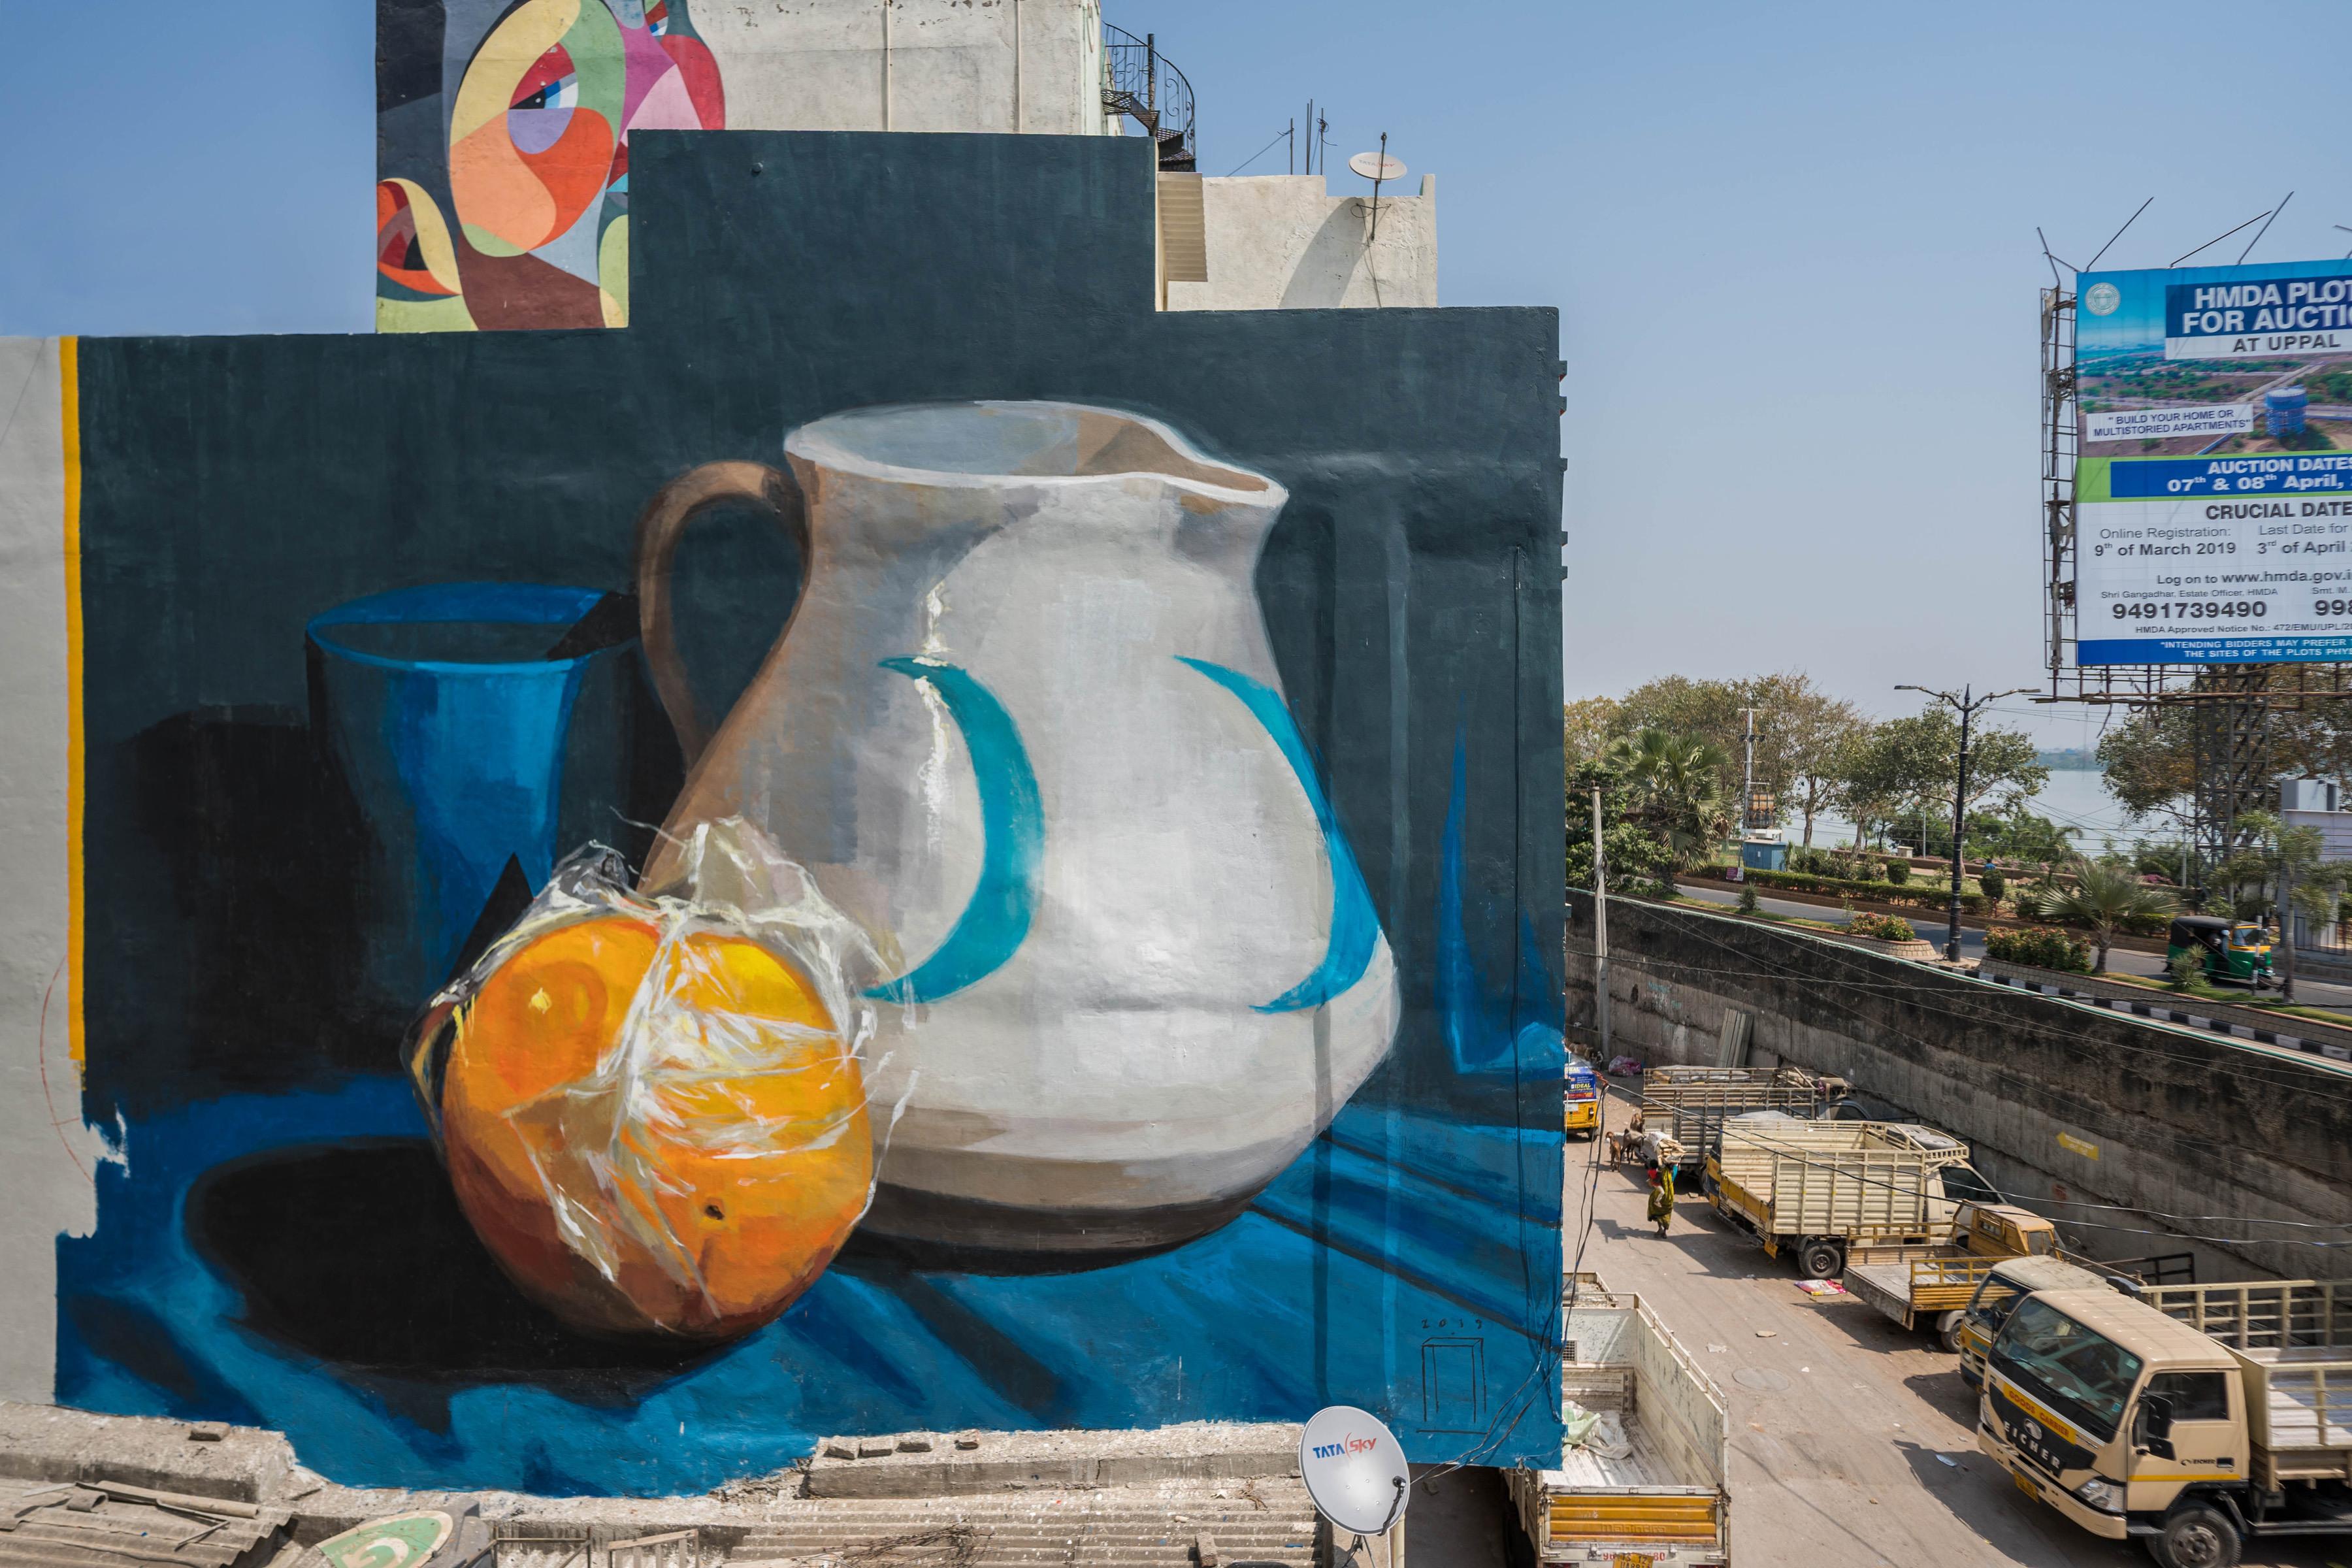 Manolo Reveals St Art Hyd 2019 Pranav Gohil 6